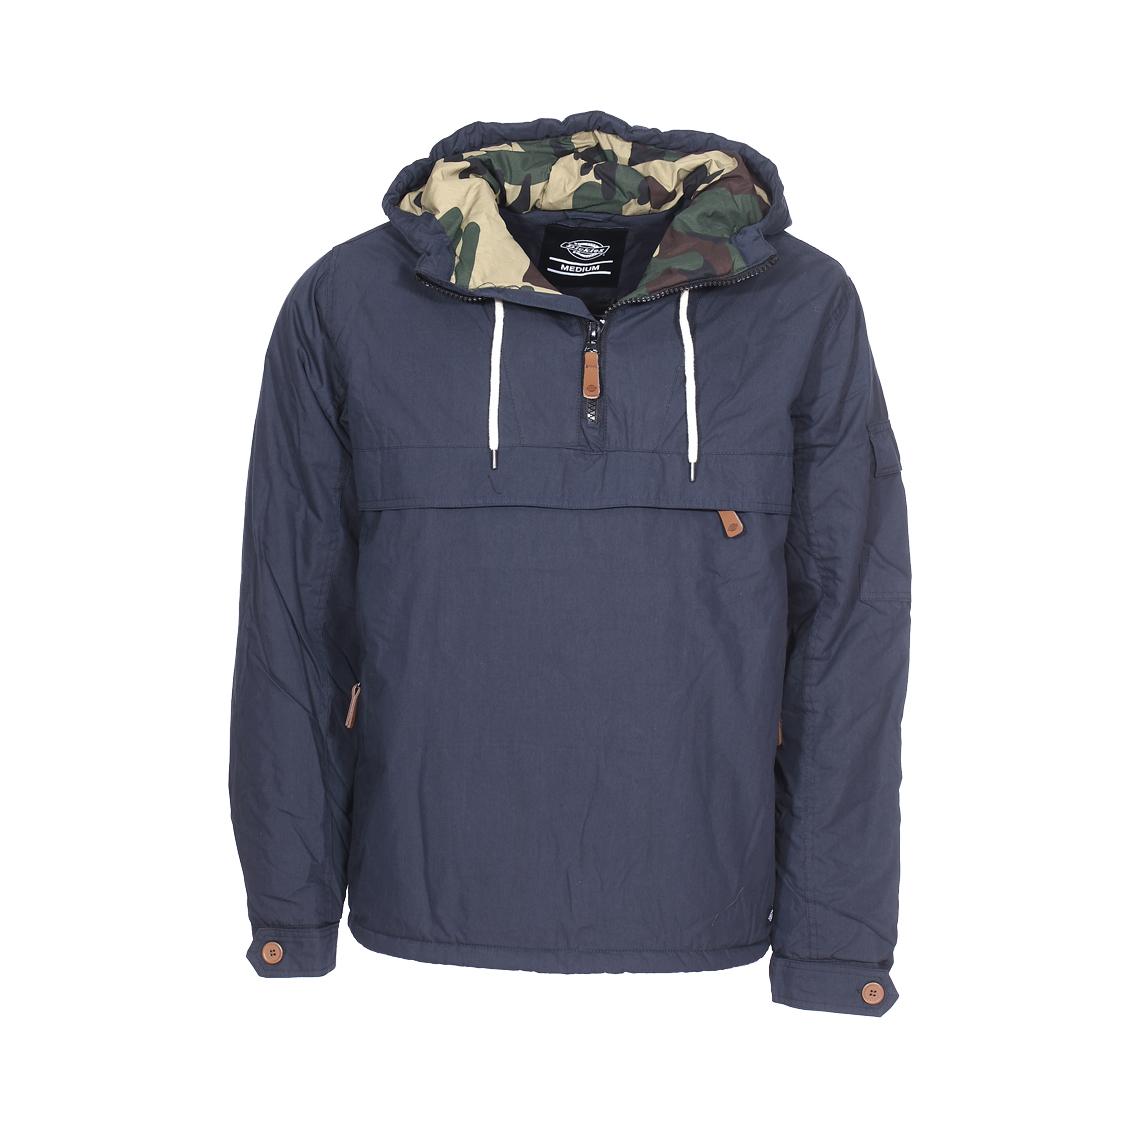 . Veste Dickies  - Coton (70%), nylon (30%) - Doublure : polyester (100%) - Bleu marine